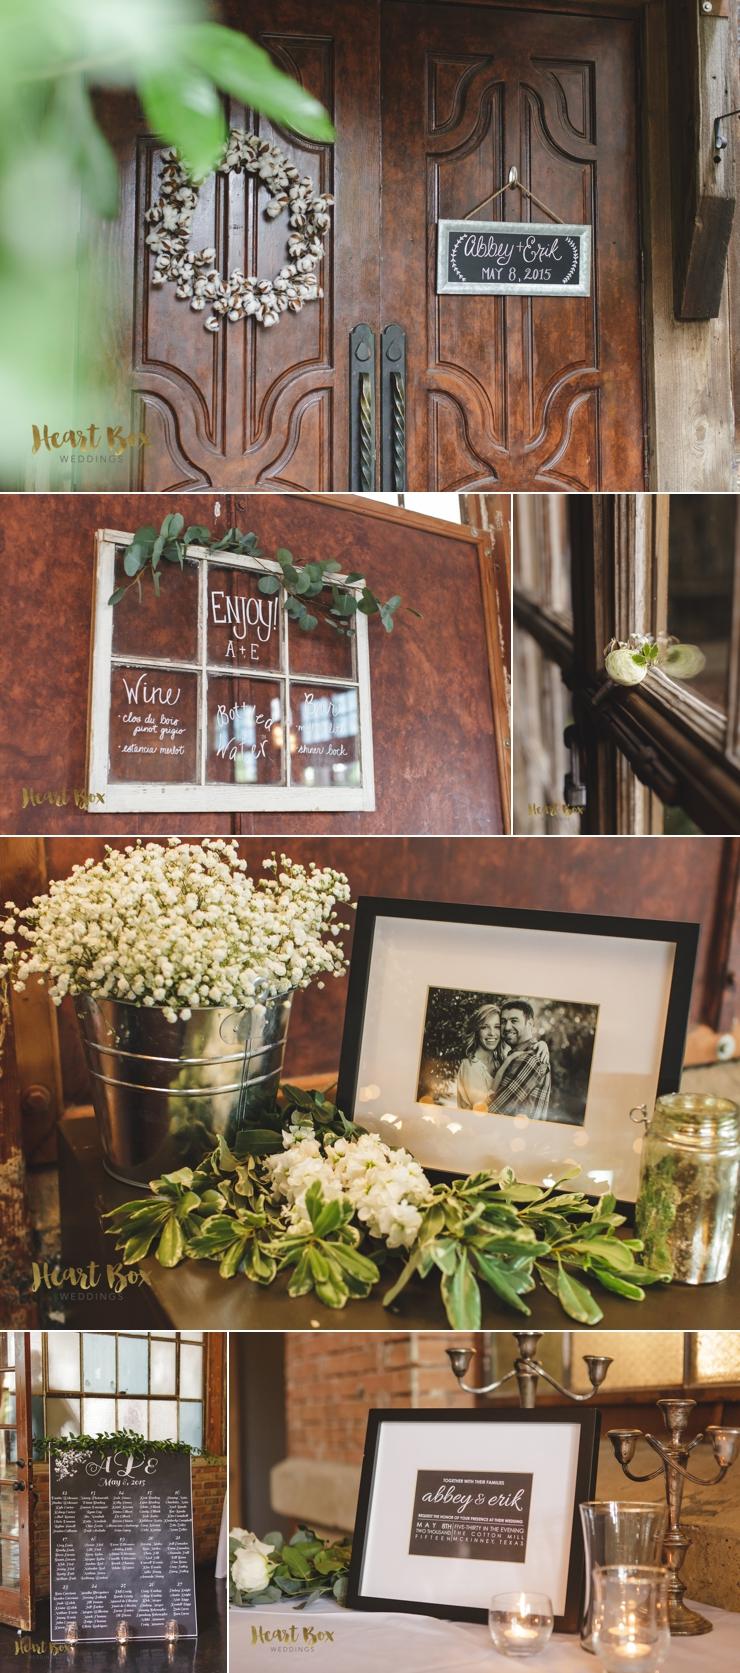 Popplewell Wedding Blog Collages 9.jpg